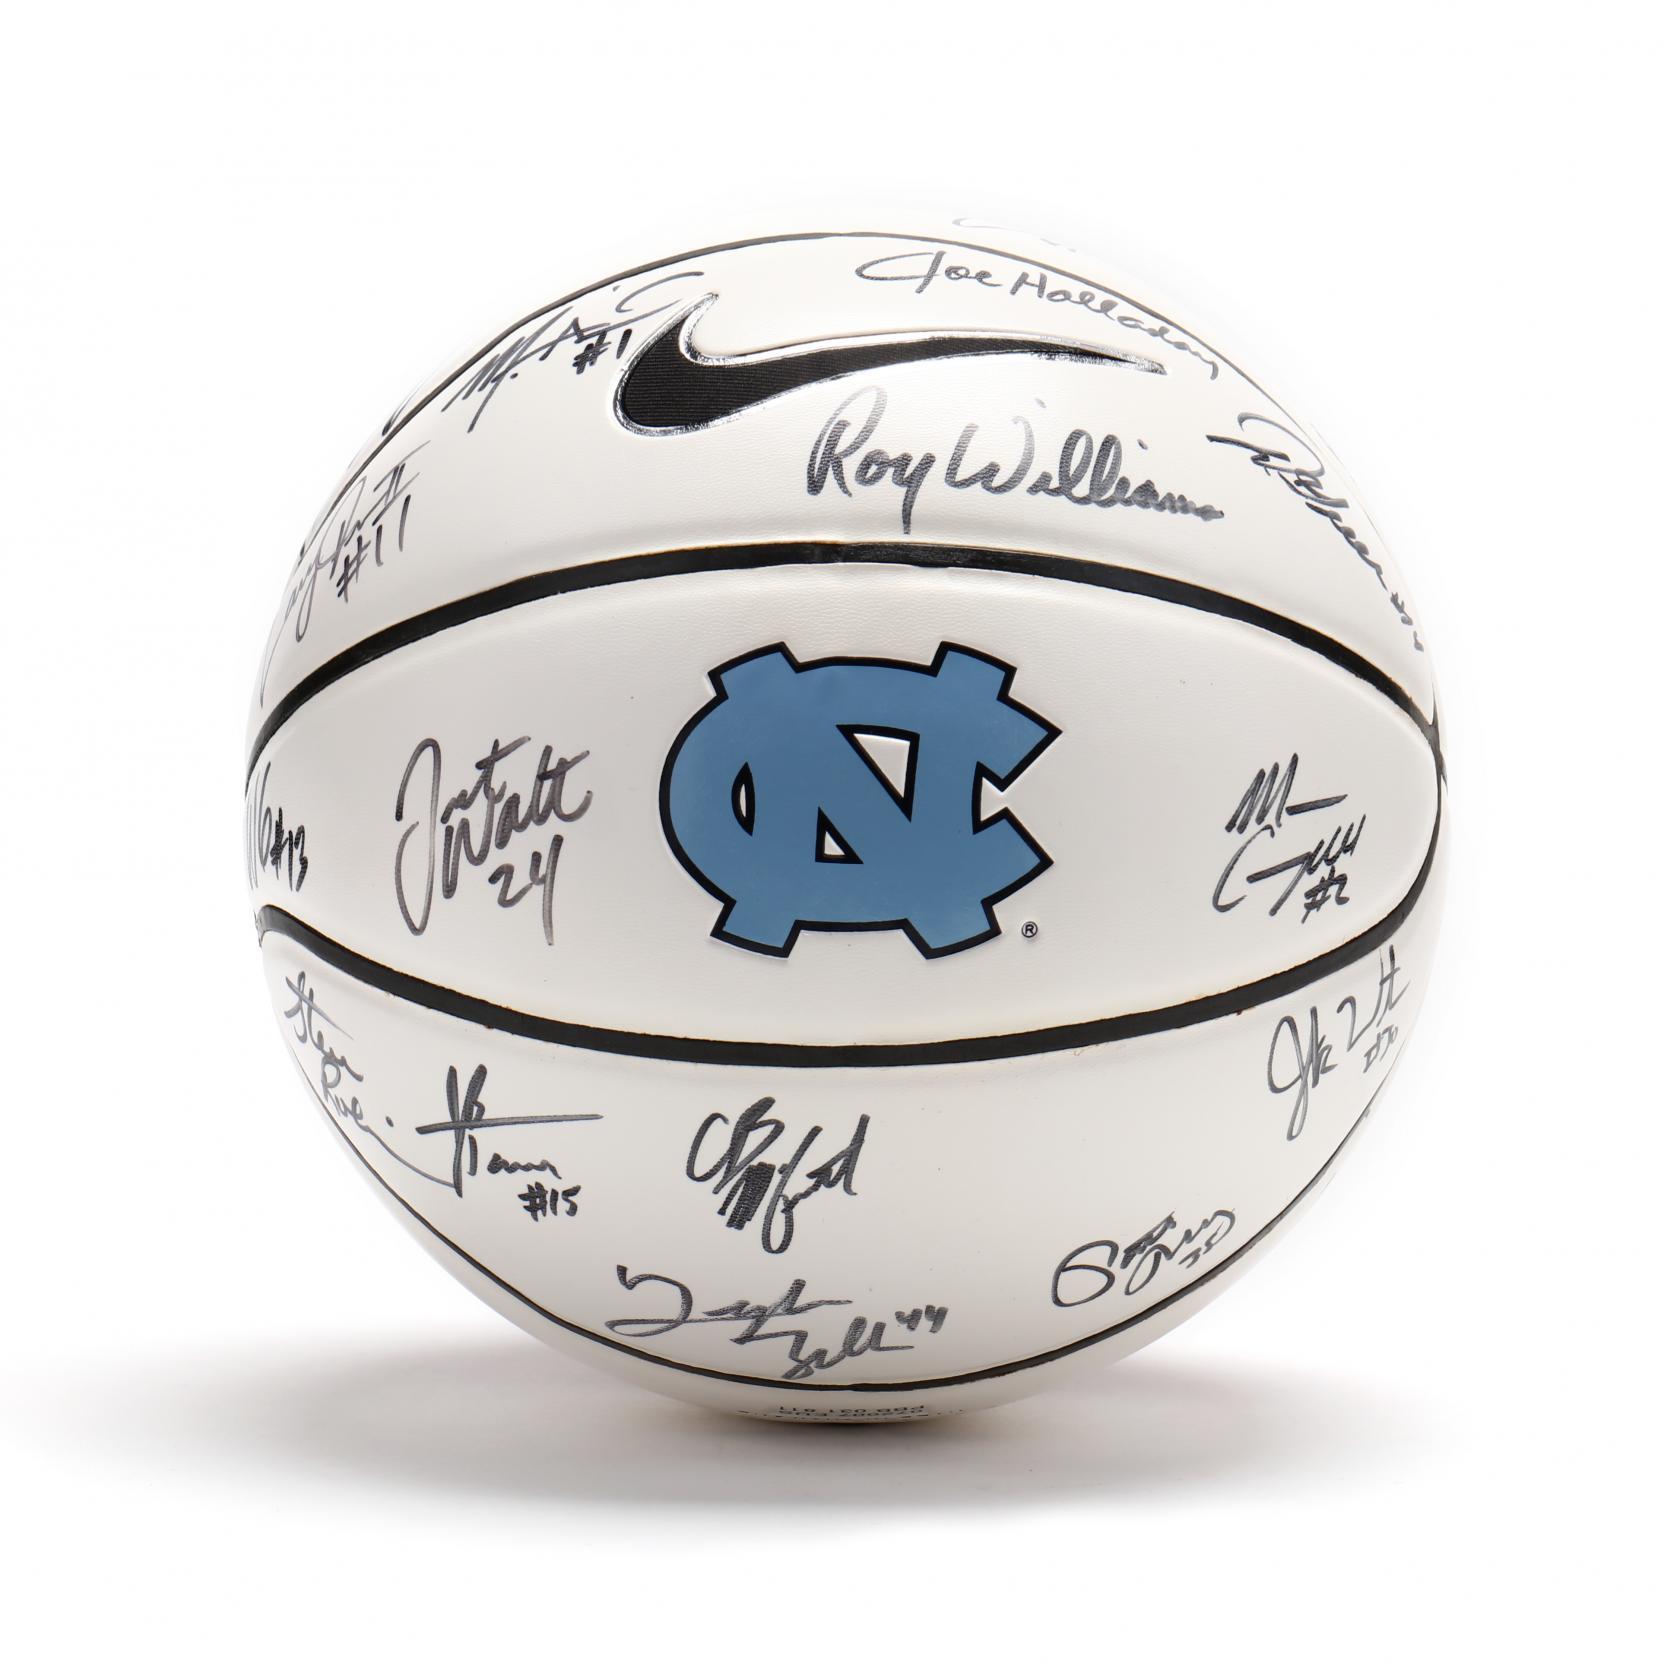 unc-team-signed-basketball-roy-williams-tyler-zeller